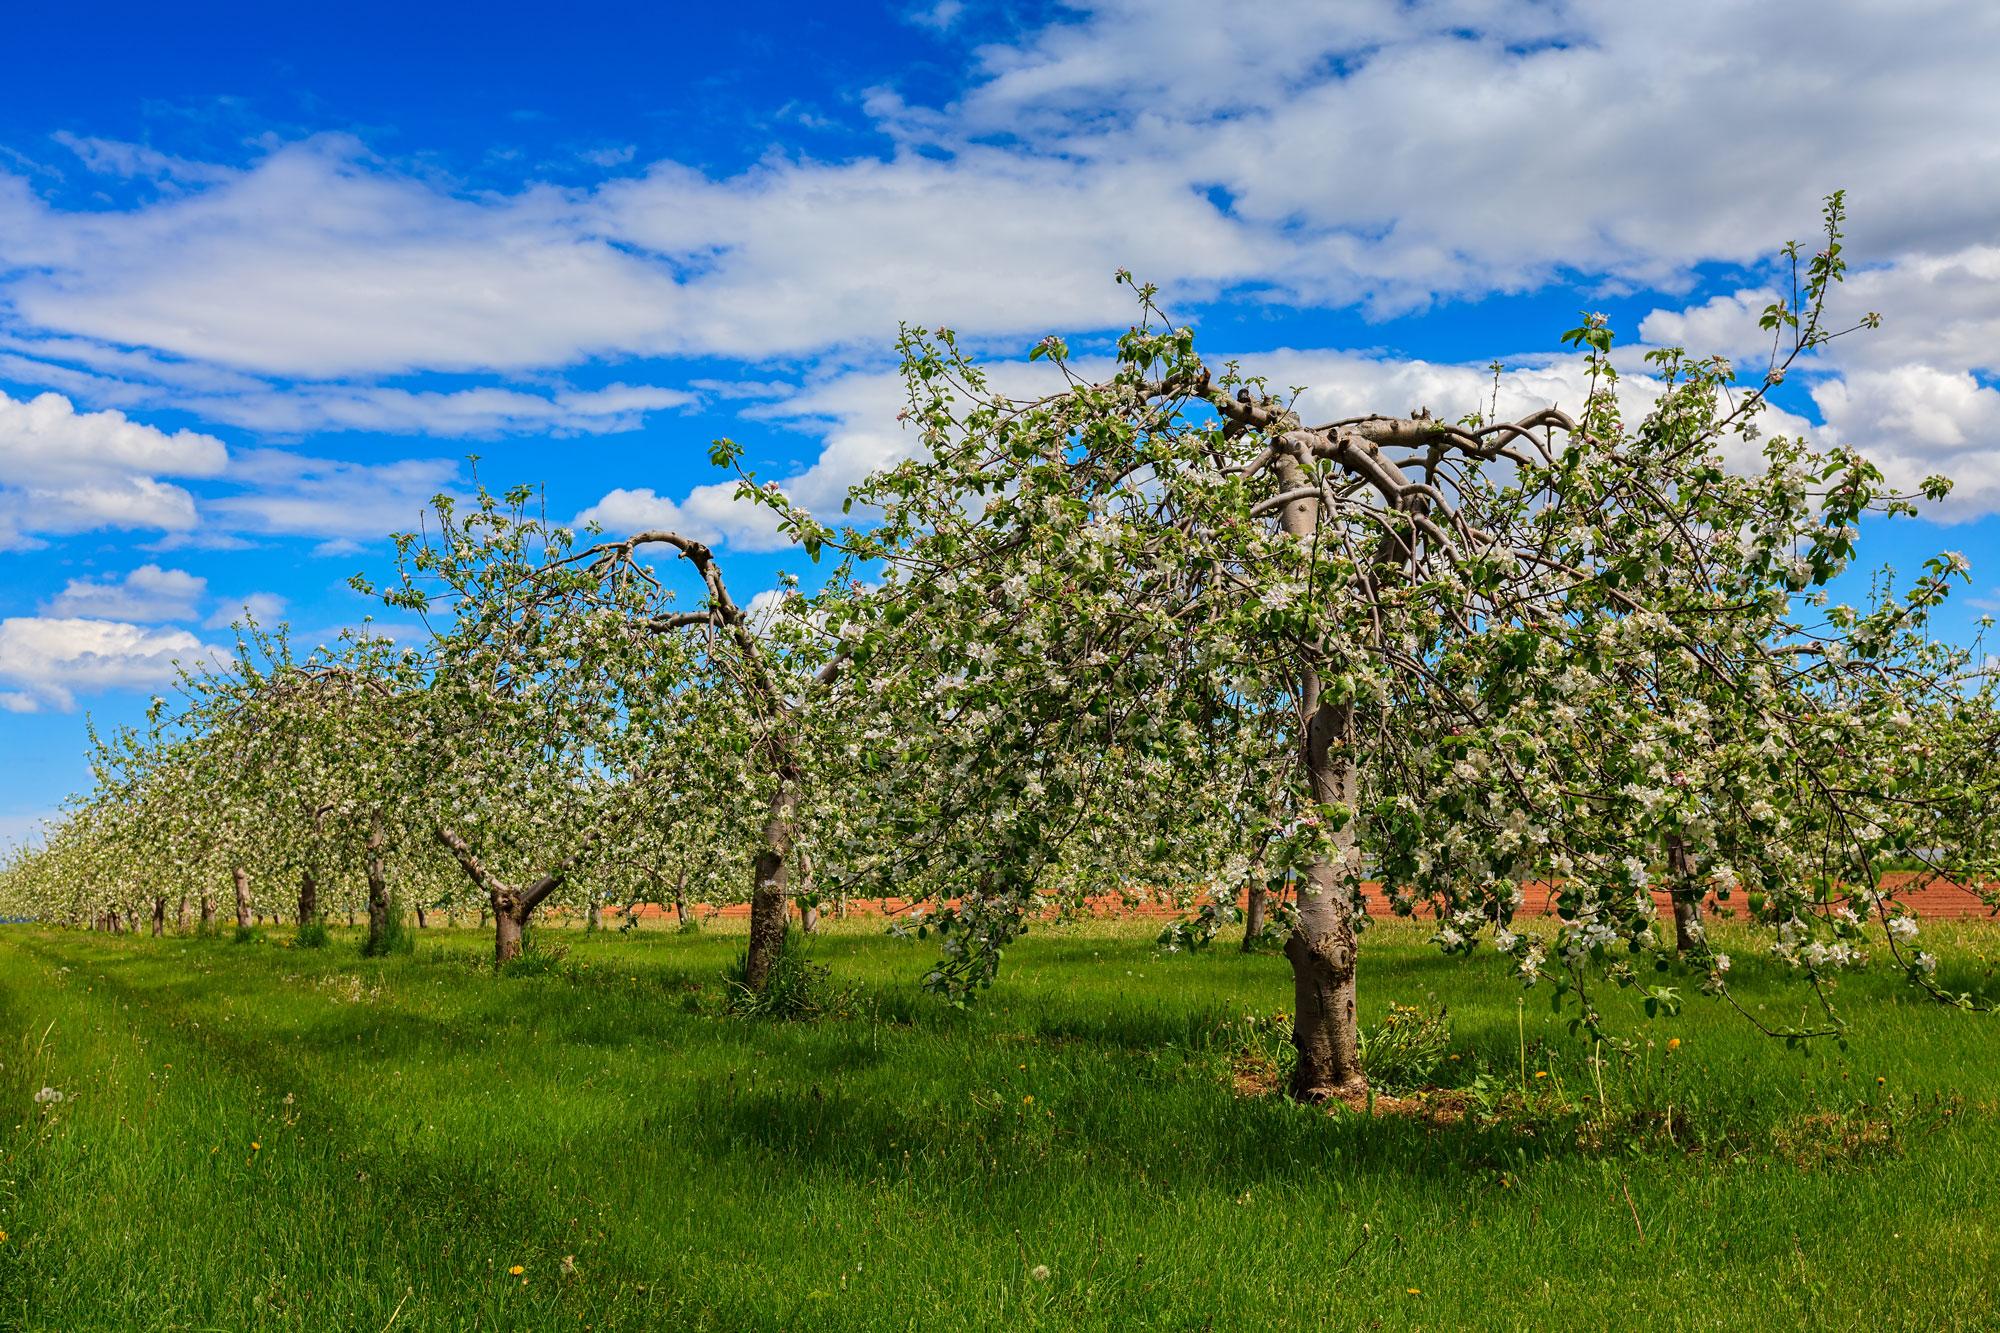 June Apple Blossoms